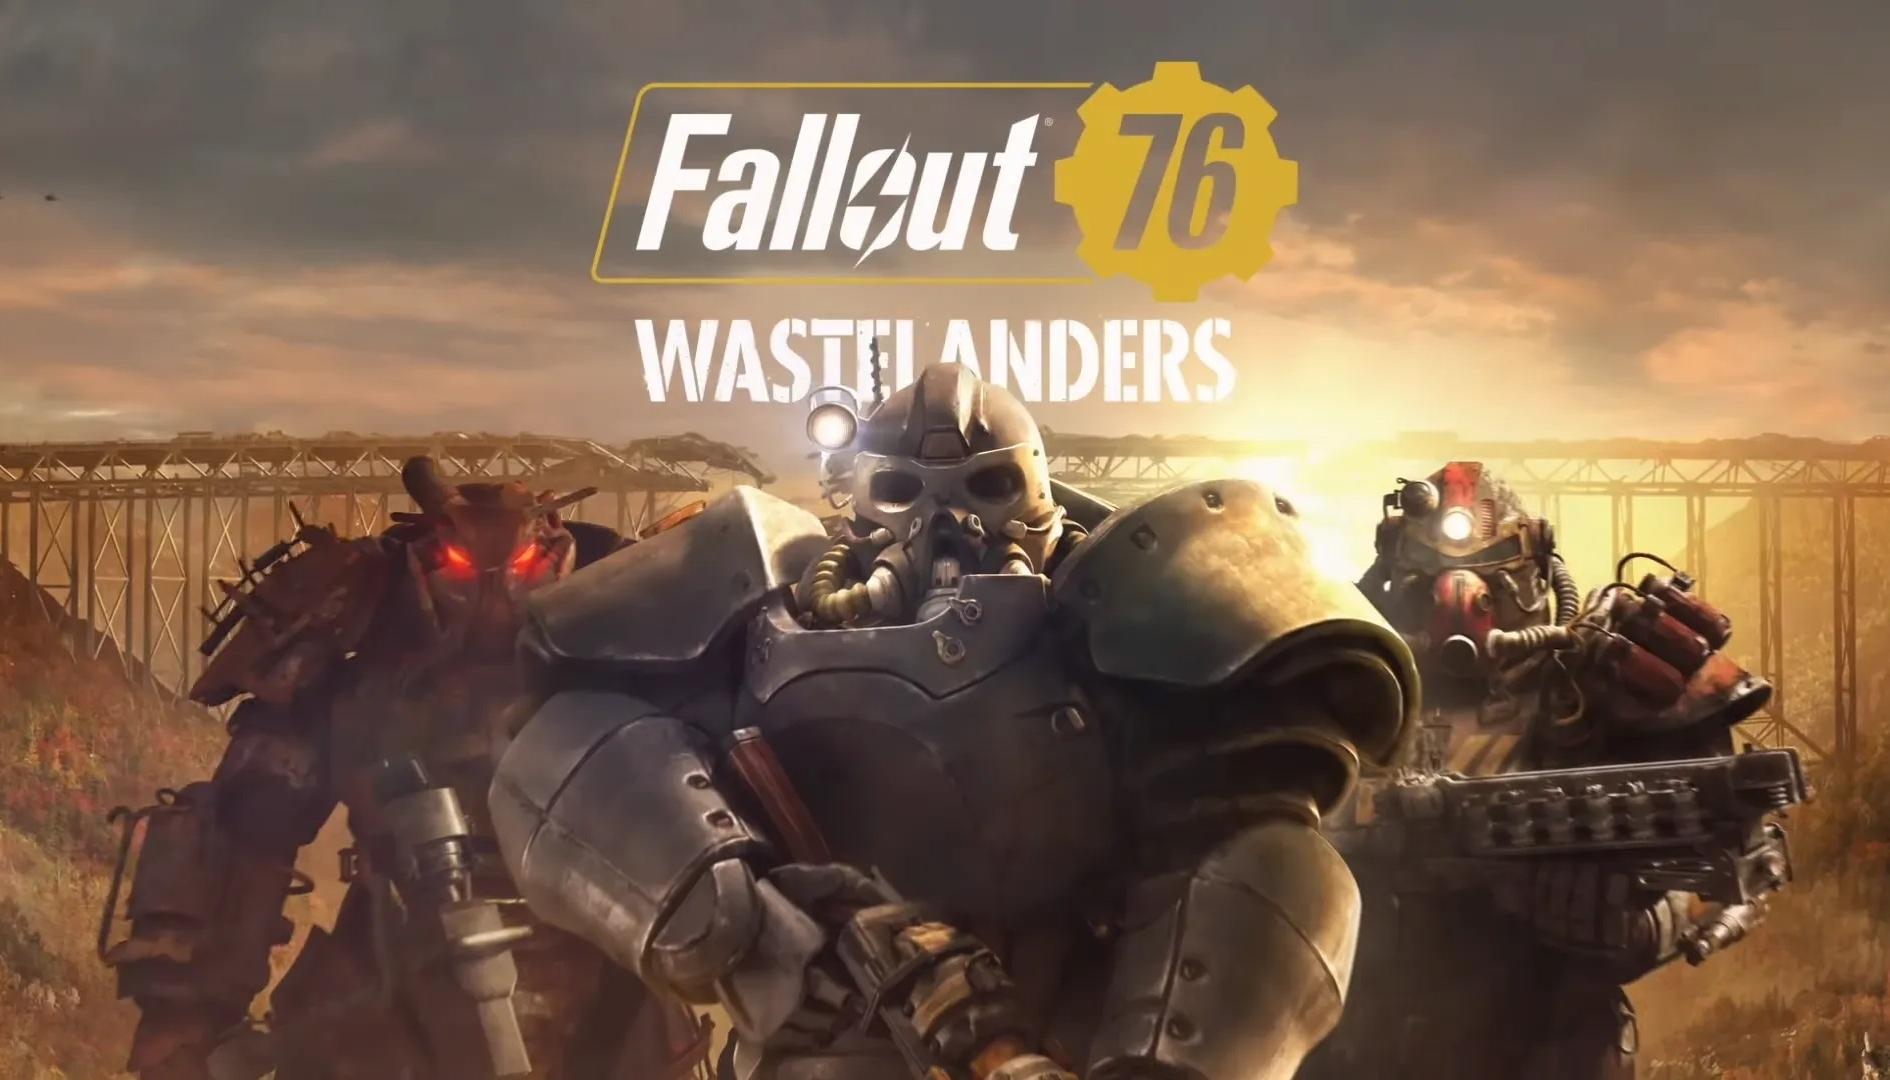 Fallout 76: il DLC Wastelanders creerà qualche problema a svariati utenti